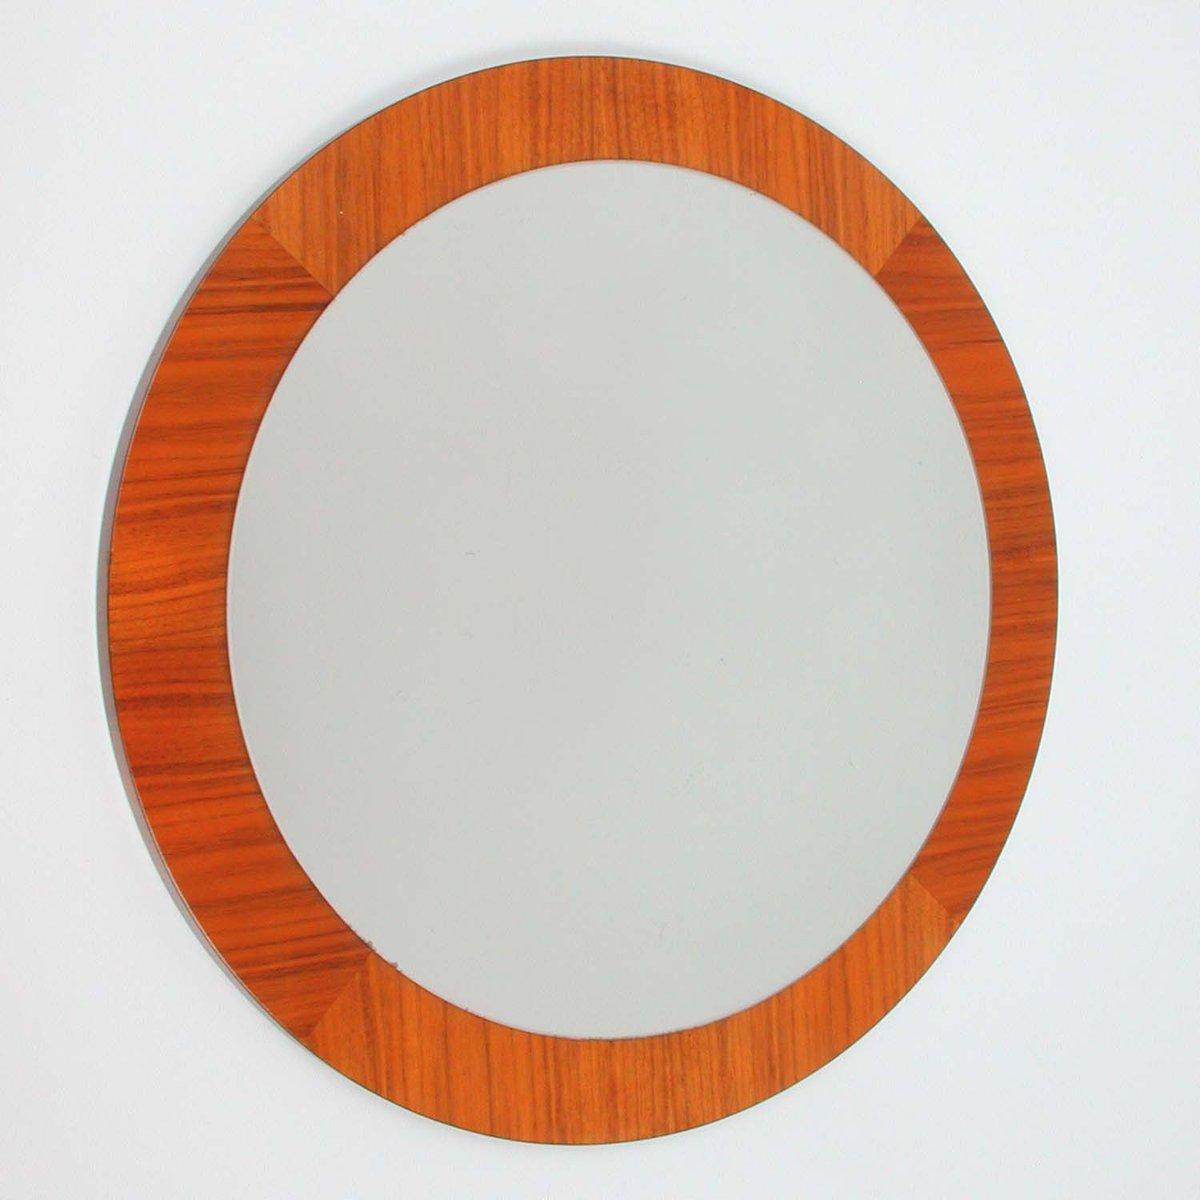 Vintage scandinavian teak wall mirror for sale at pamono vintage scandinavian teak wall mirror amipublicfo Gallery